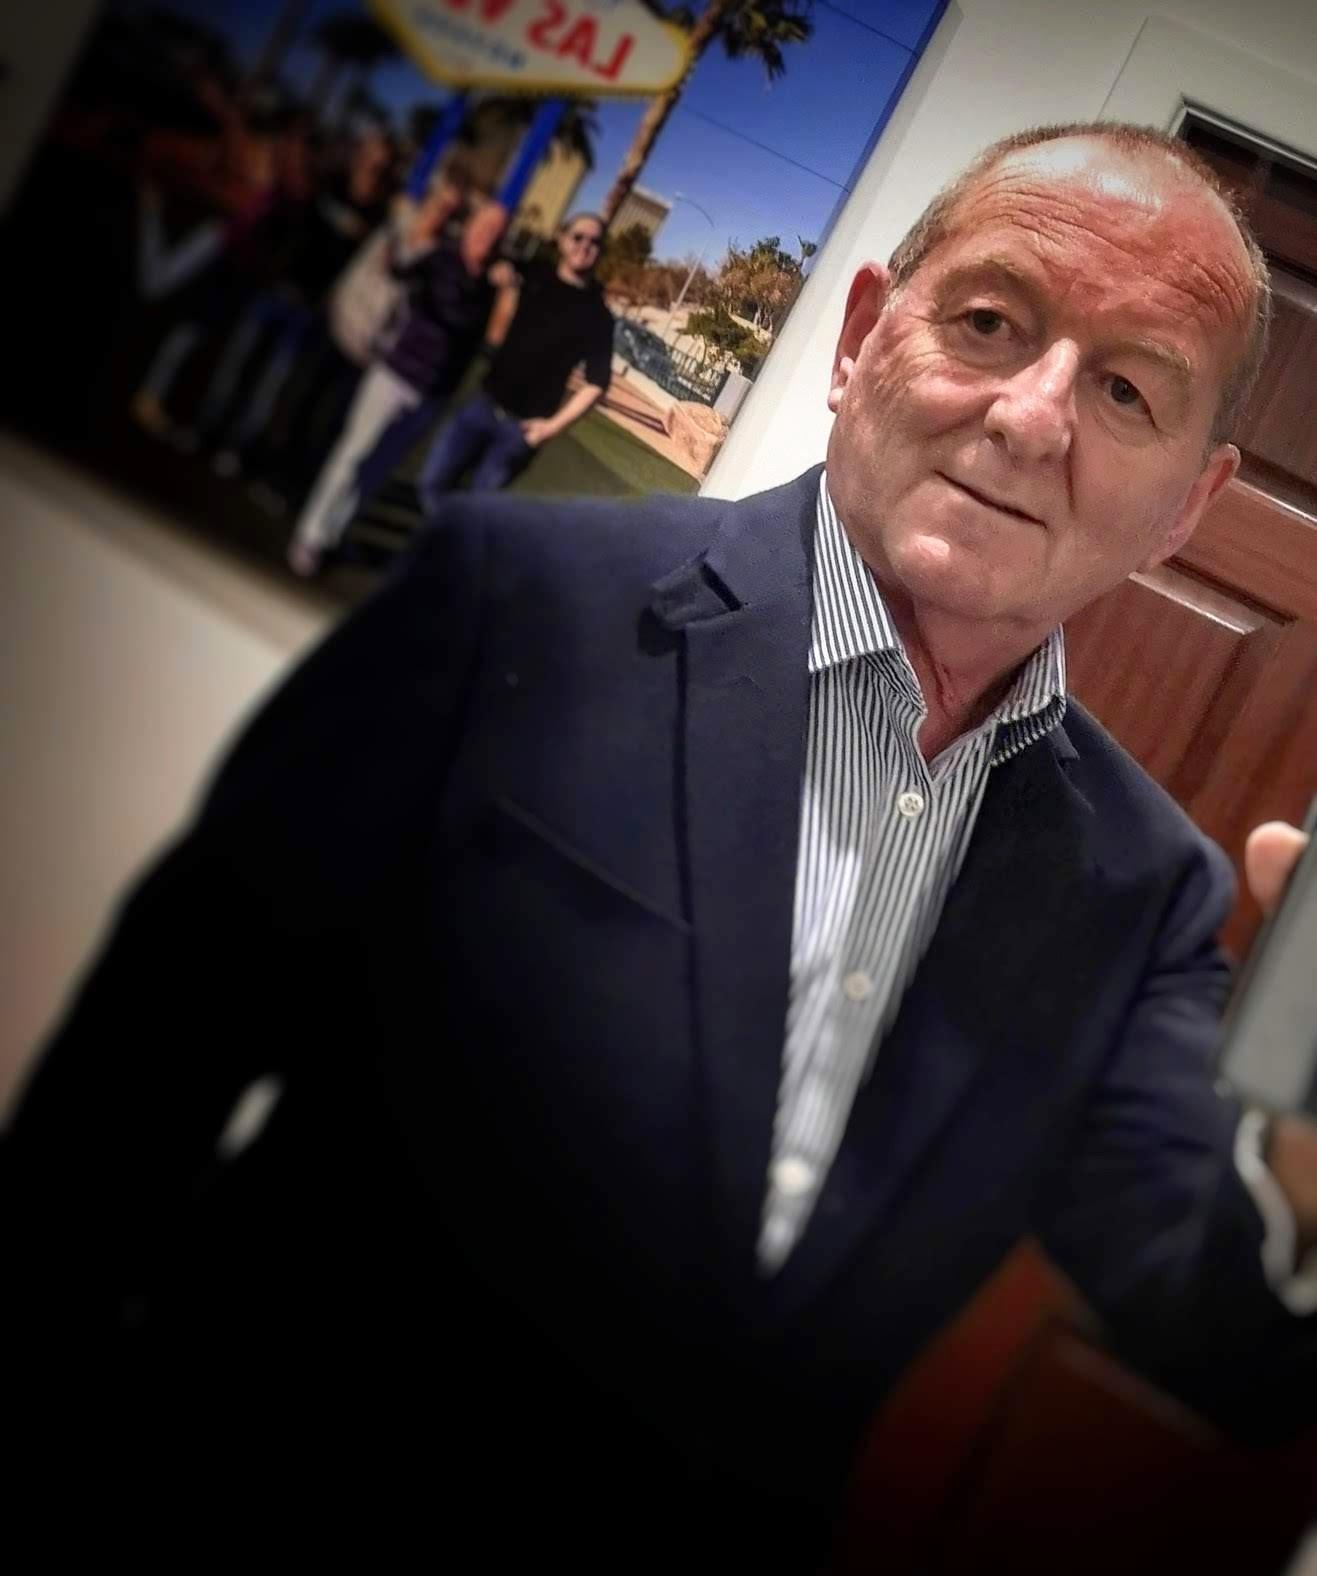 Alan Rait Specialist Equity Release Adviser